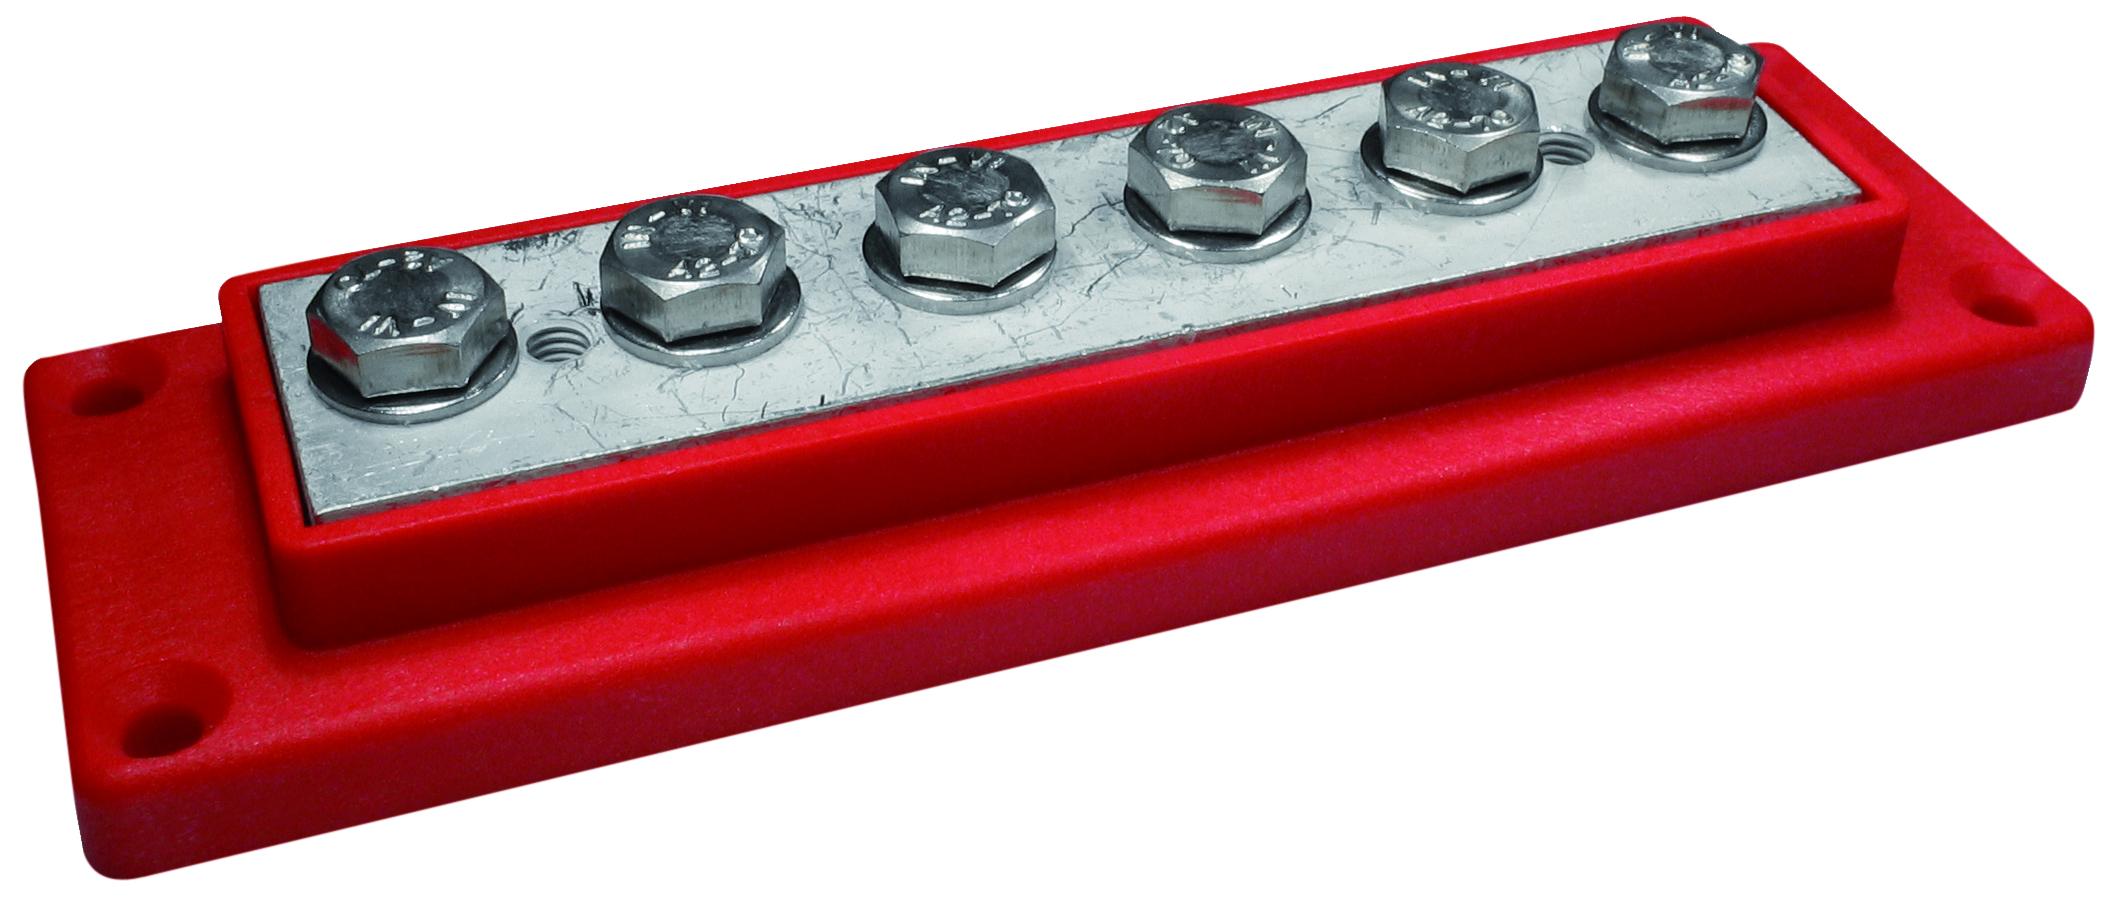 Kopplingsplint röd 6 x 50 mm²